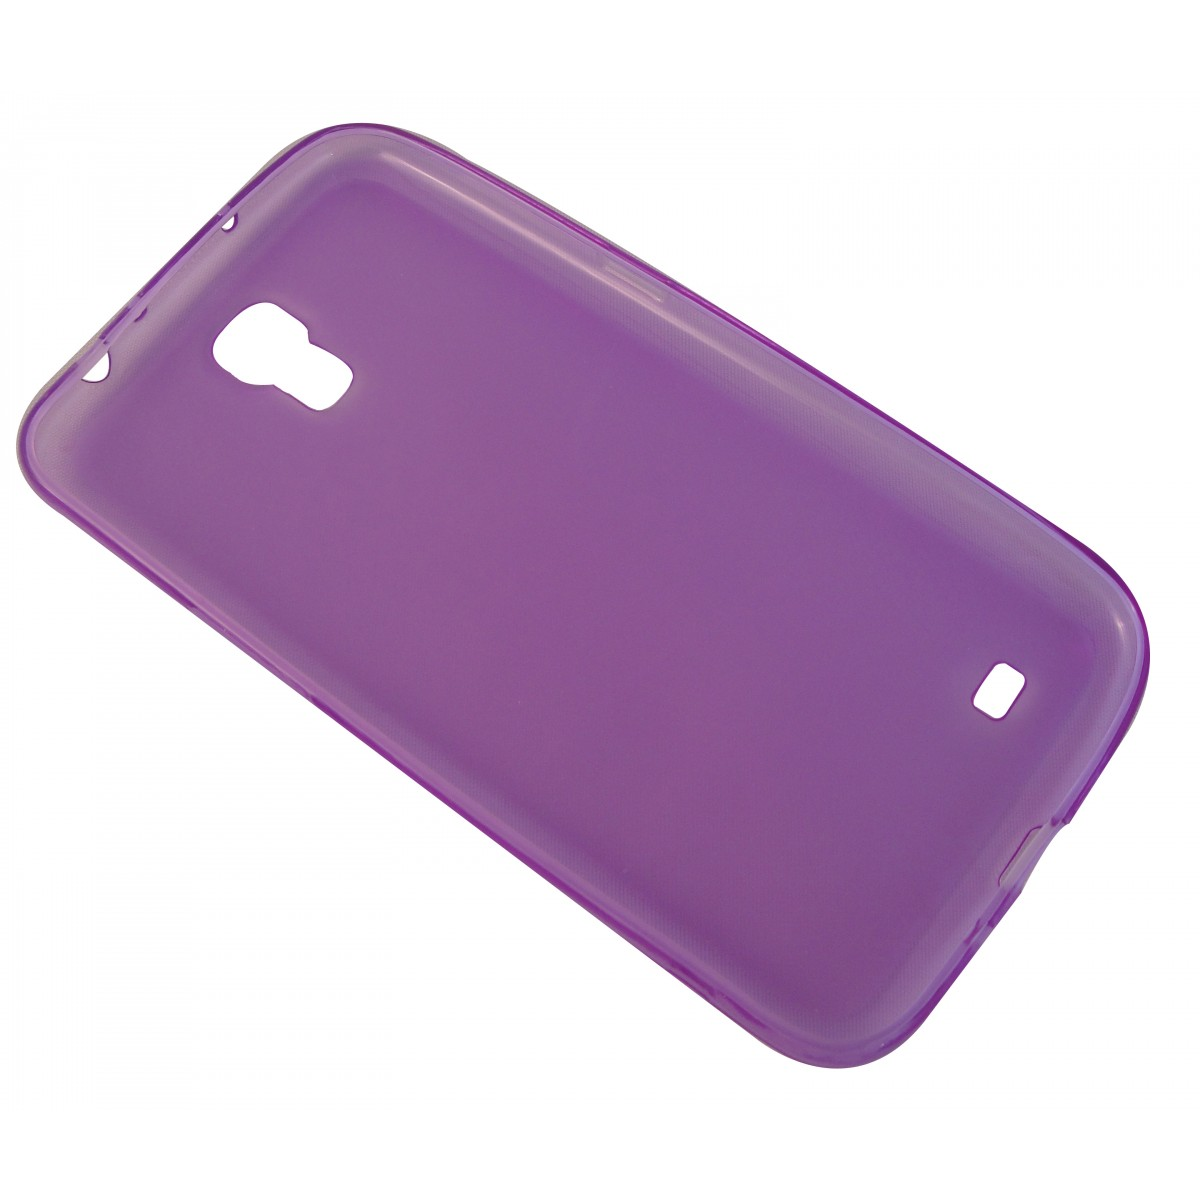 Capa de Tpu para Samsung Galaxy Mega 6.3 I9200 I9208  Pelicula Lilas